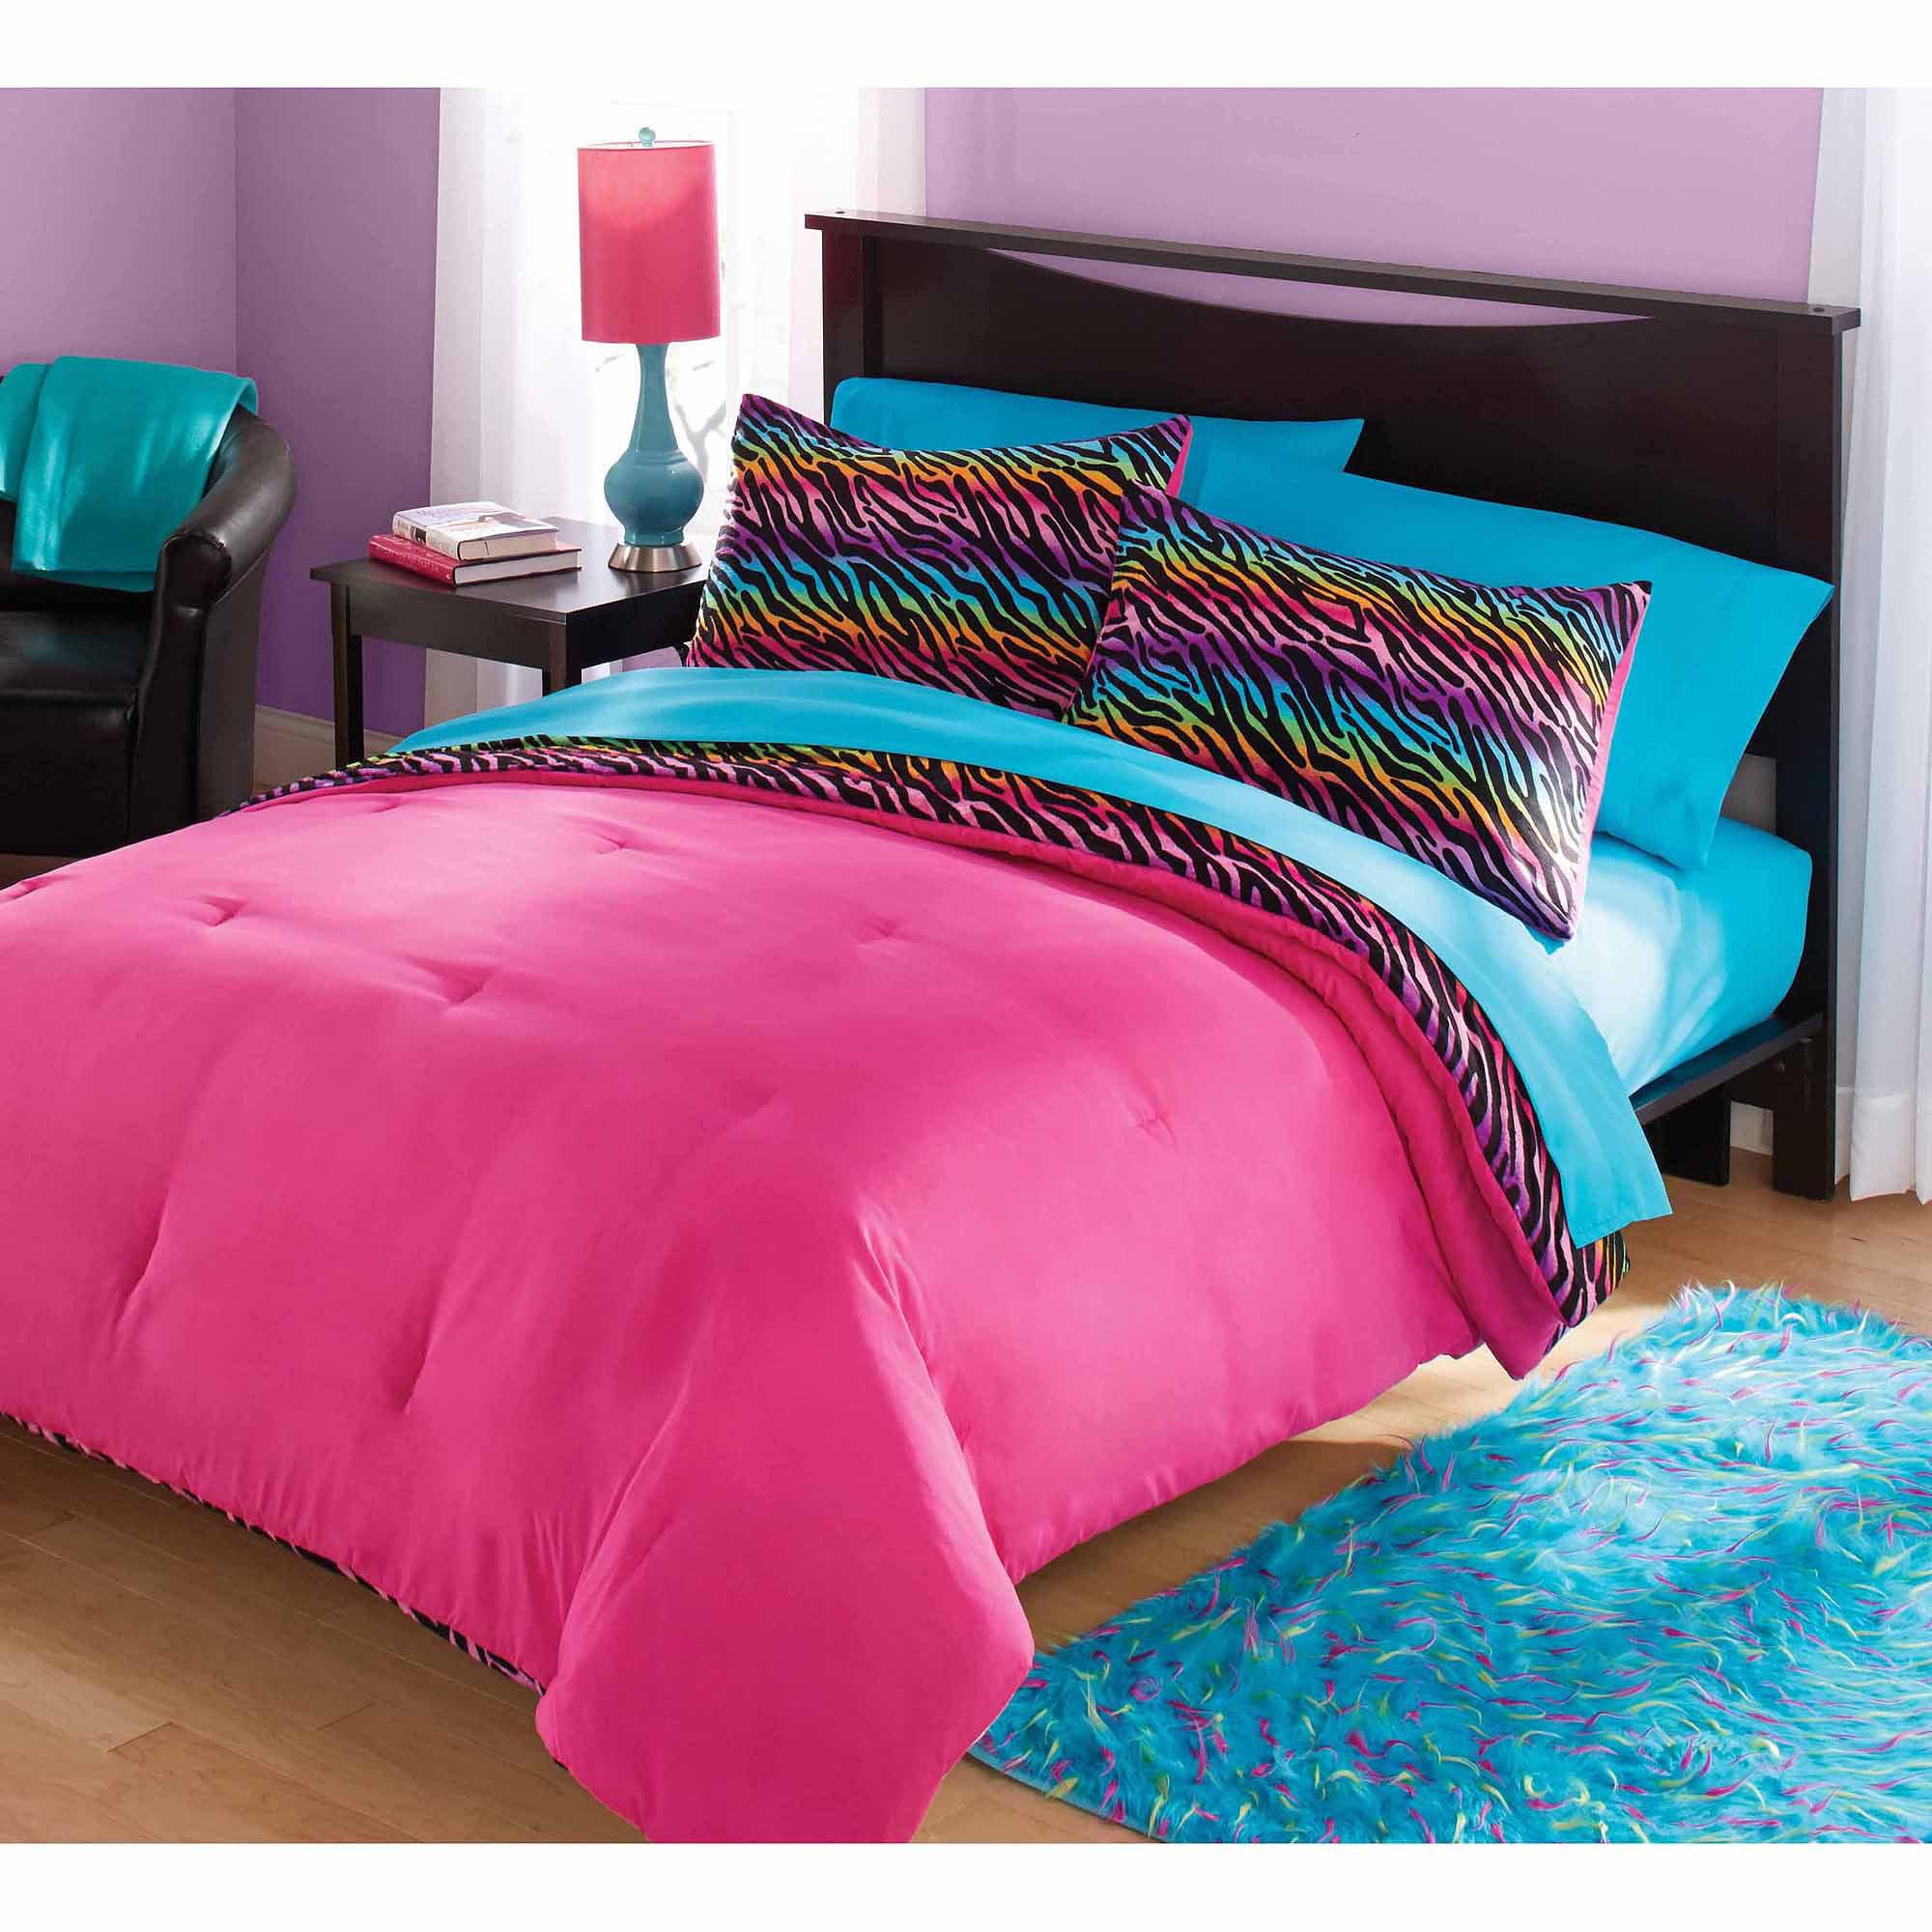 pink zebra bedding sets twin